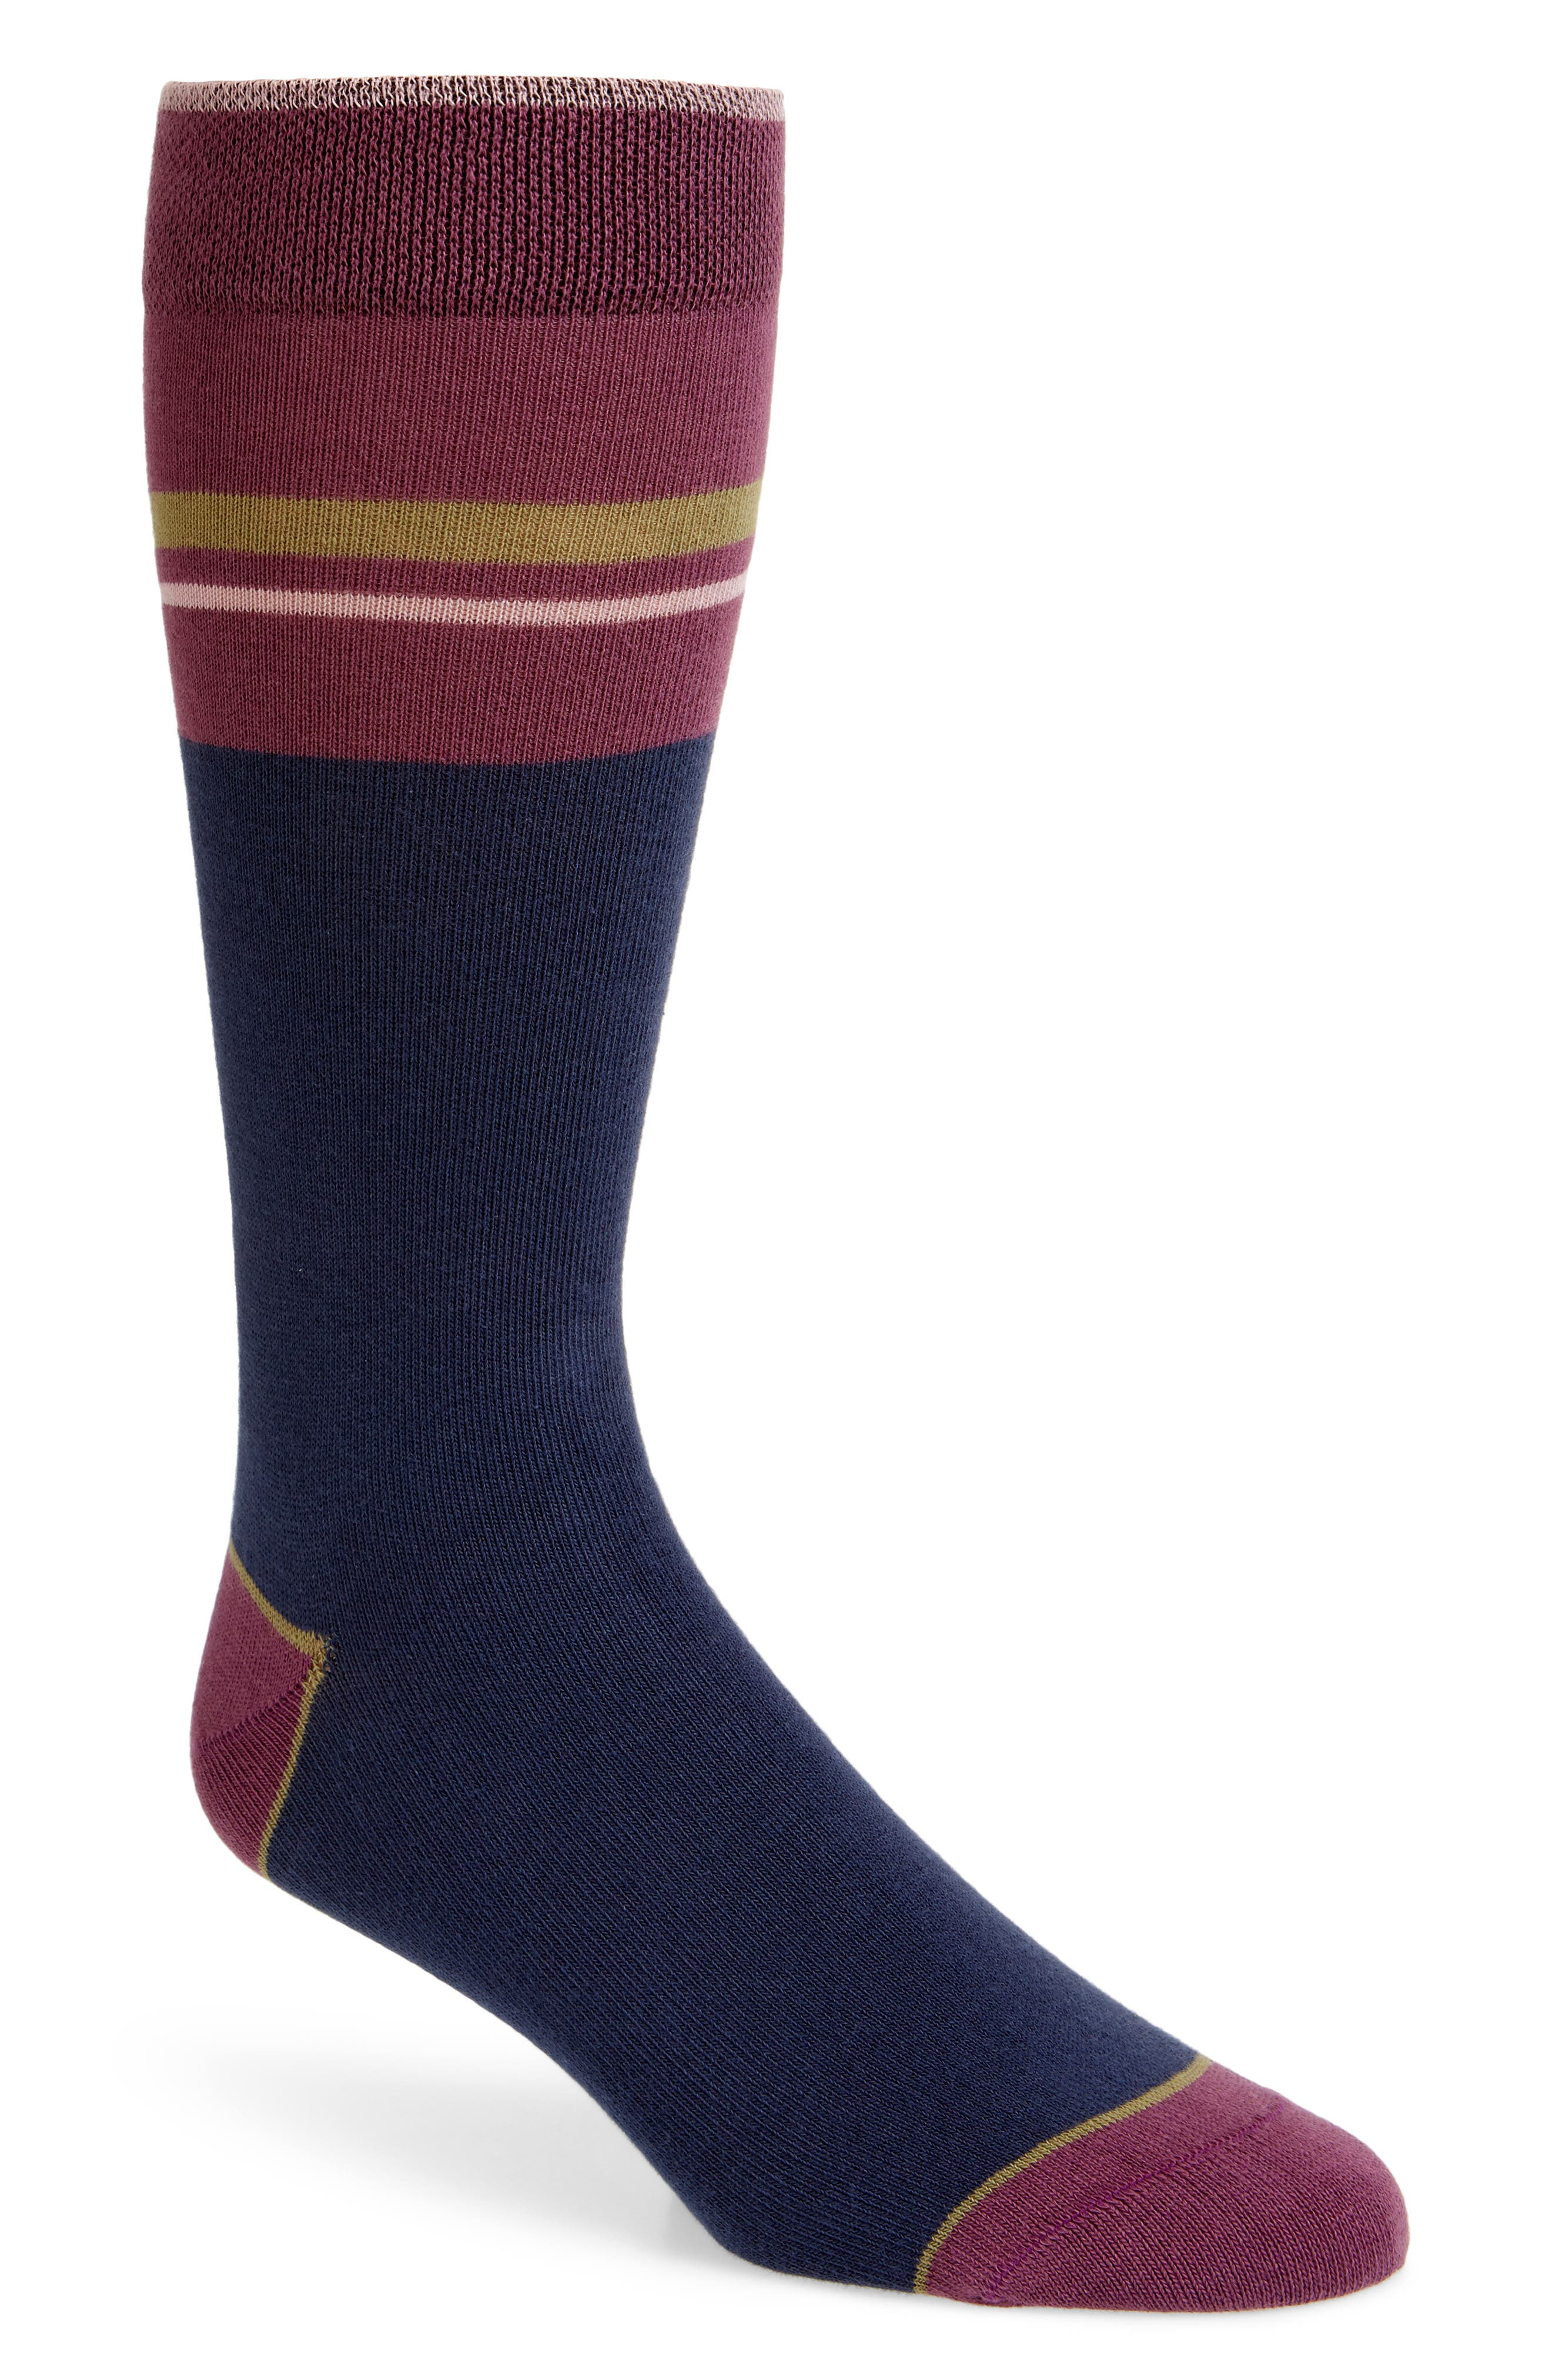 Amorpe Stripe Socks,                             Main thumbnail 1, color,                             NAVY